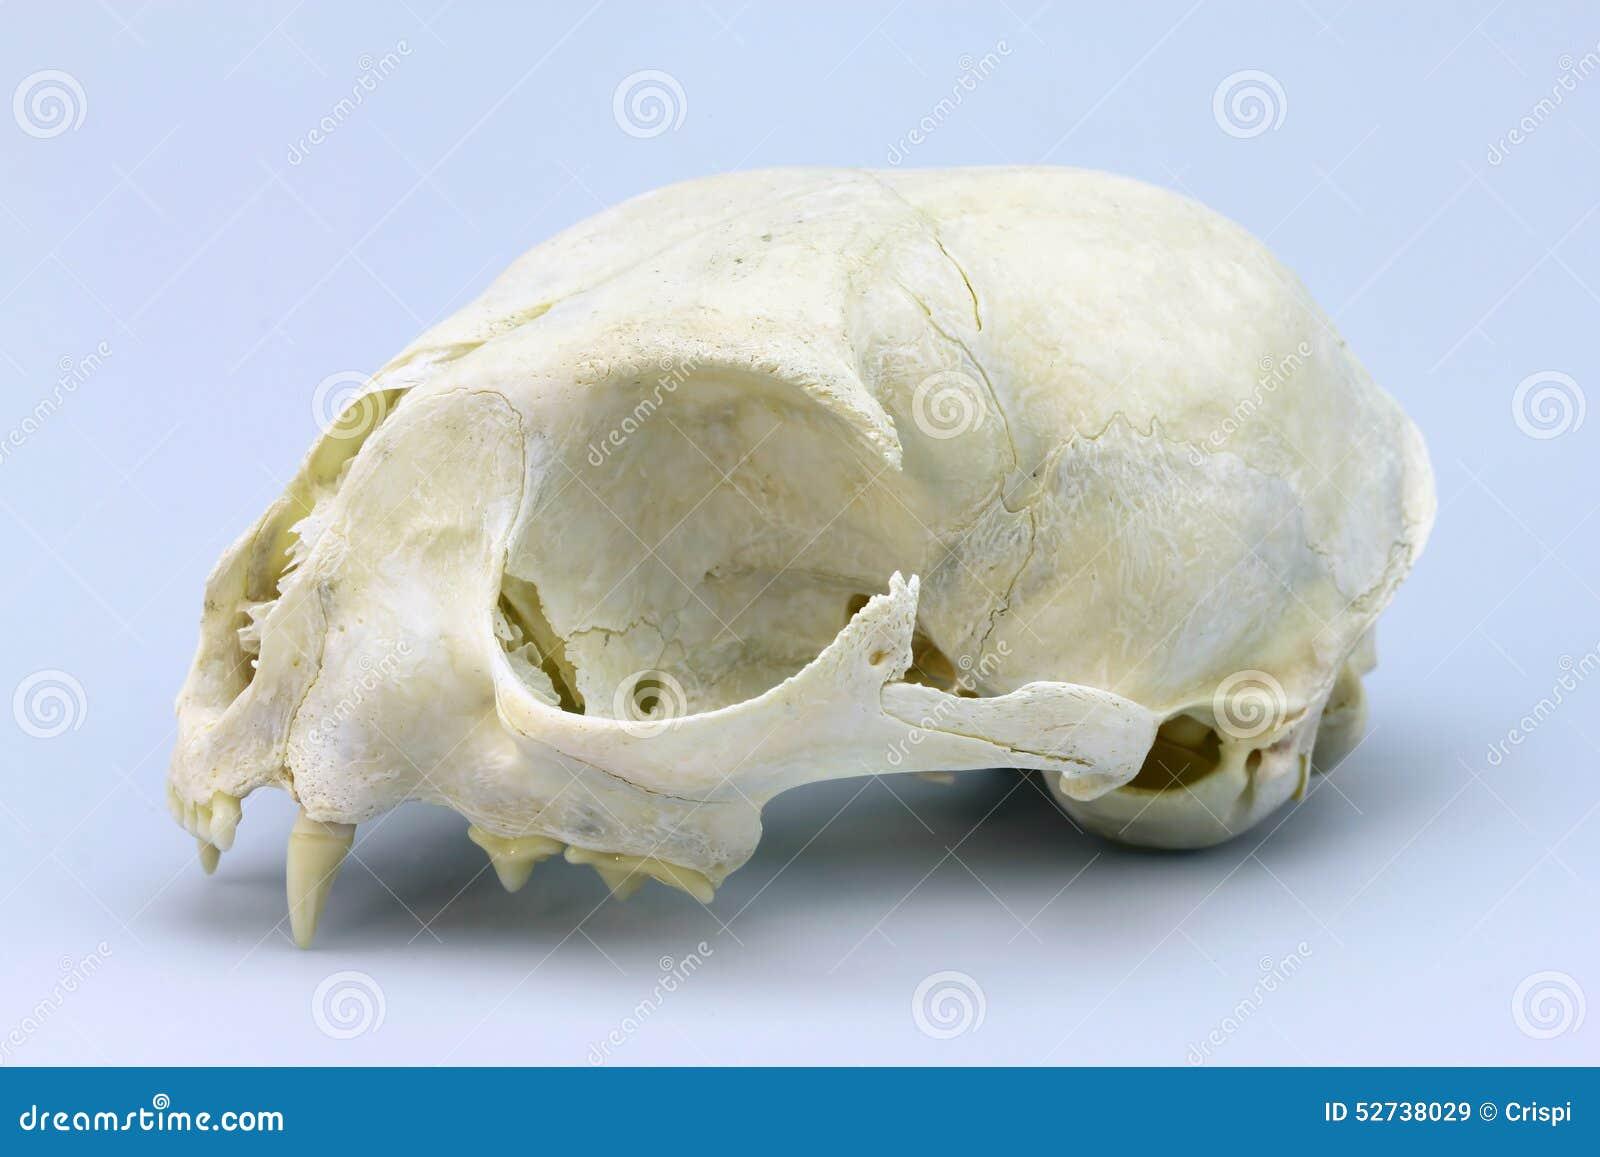 Cat Skull Stock Image Image Of Skeleton Brain Anatomy 52738029